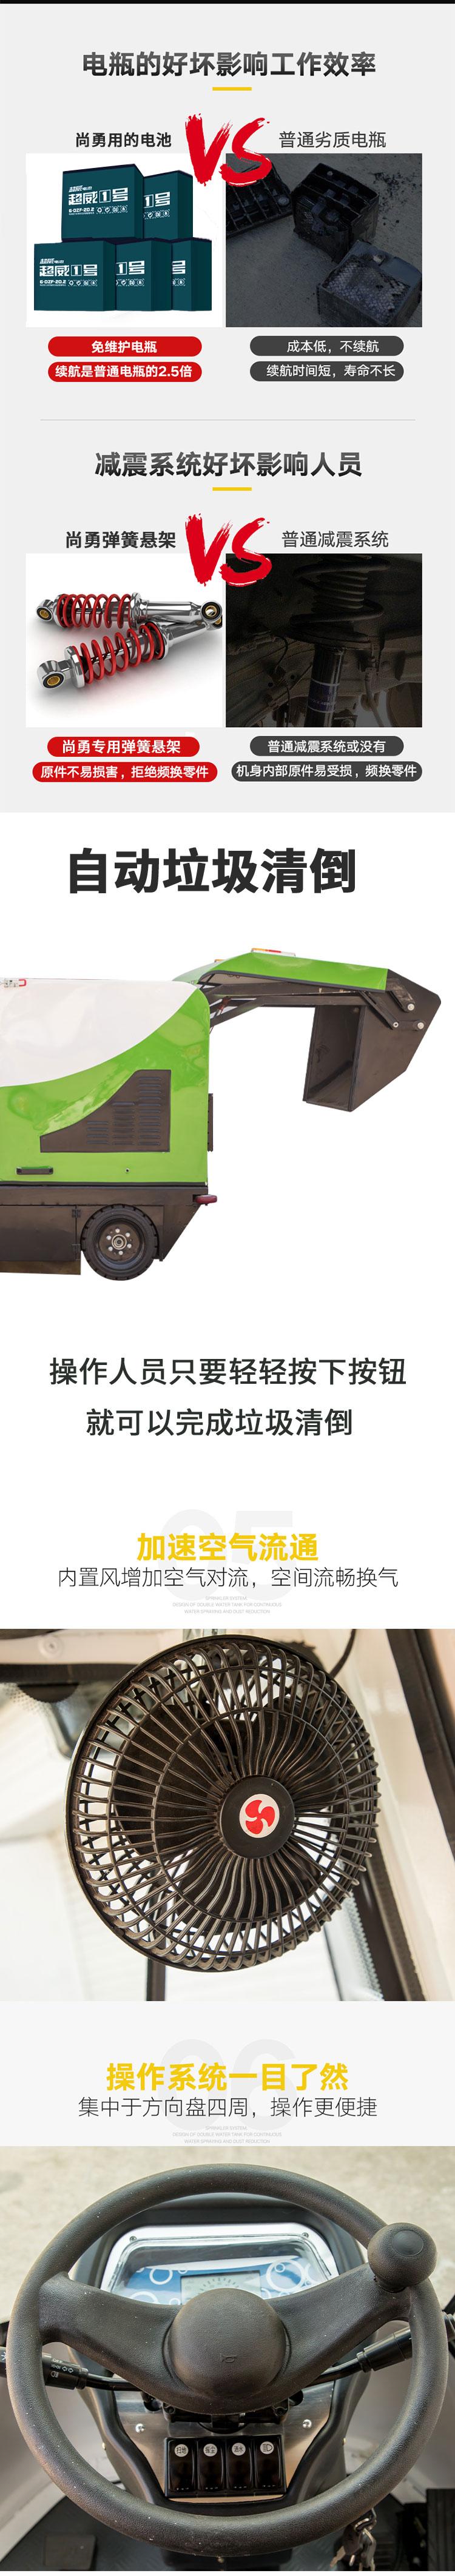 SYS-2000z全封闭驾驶式扫地车